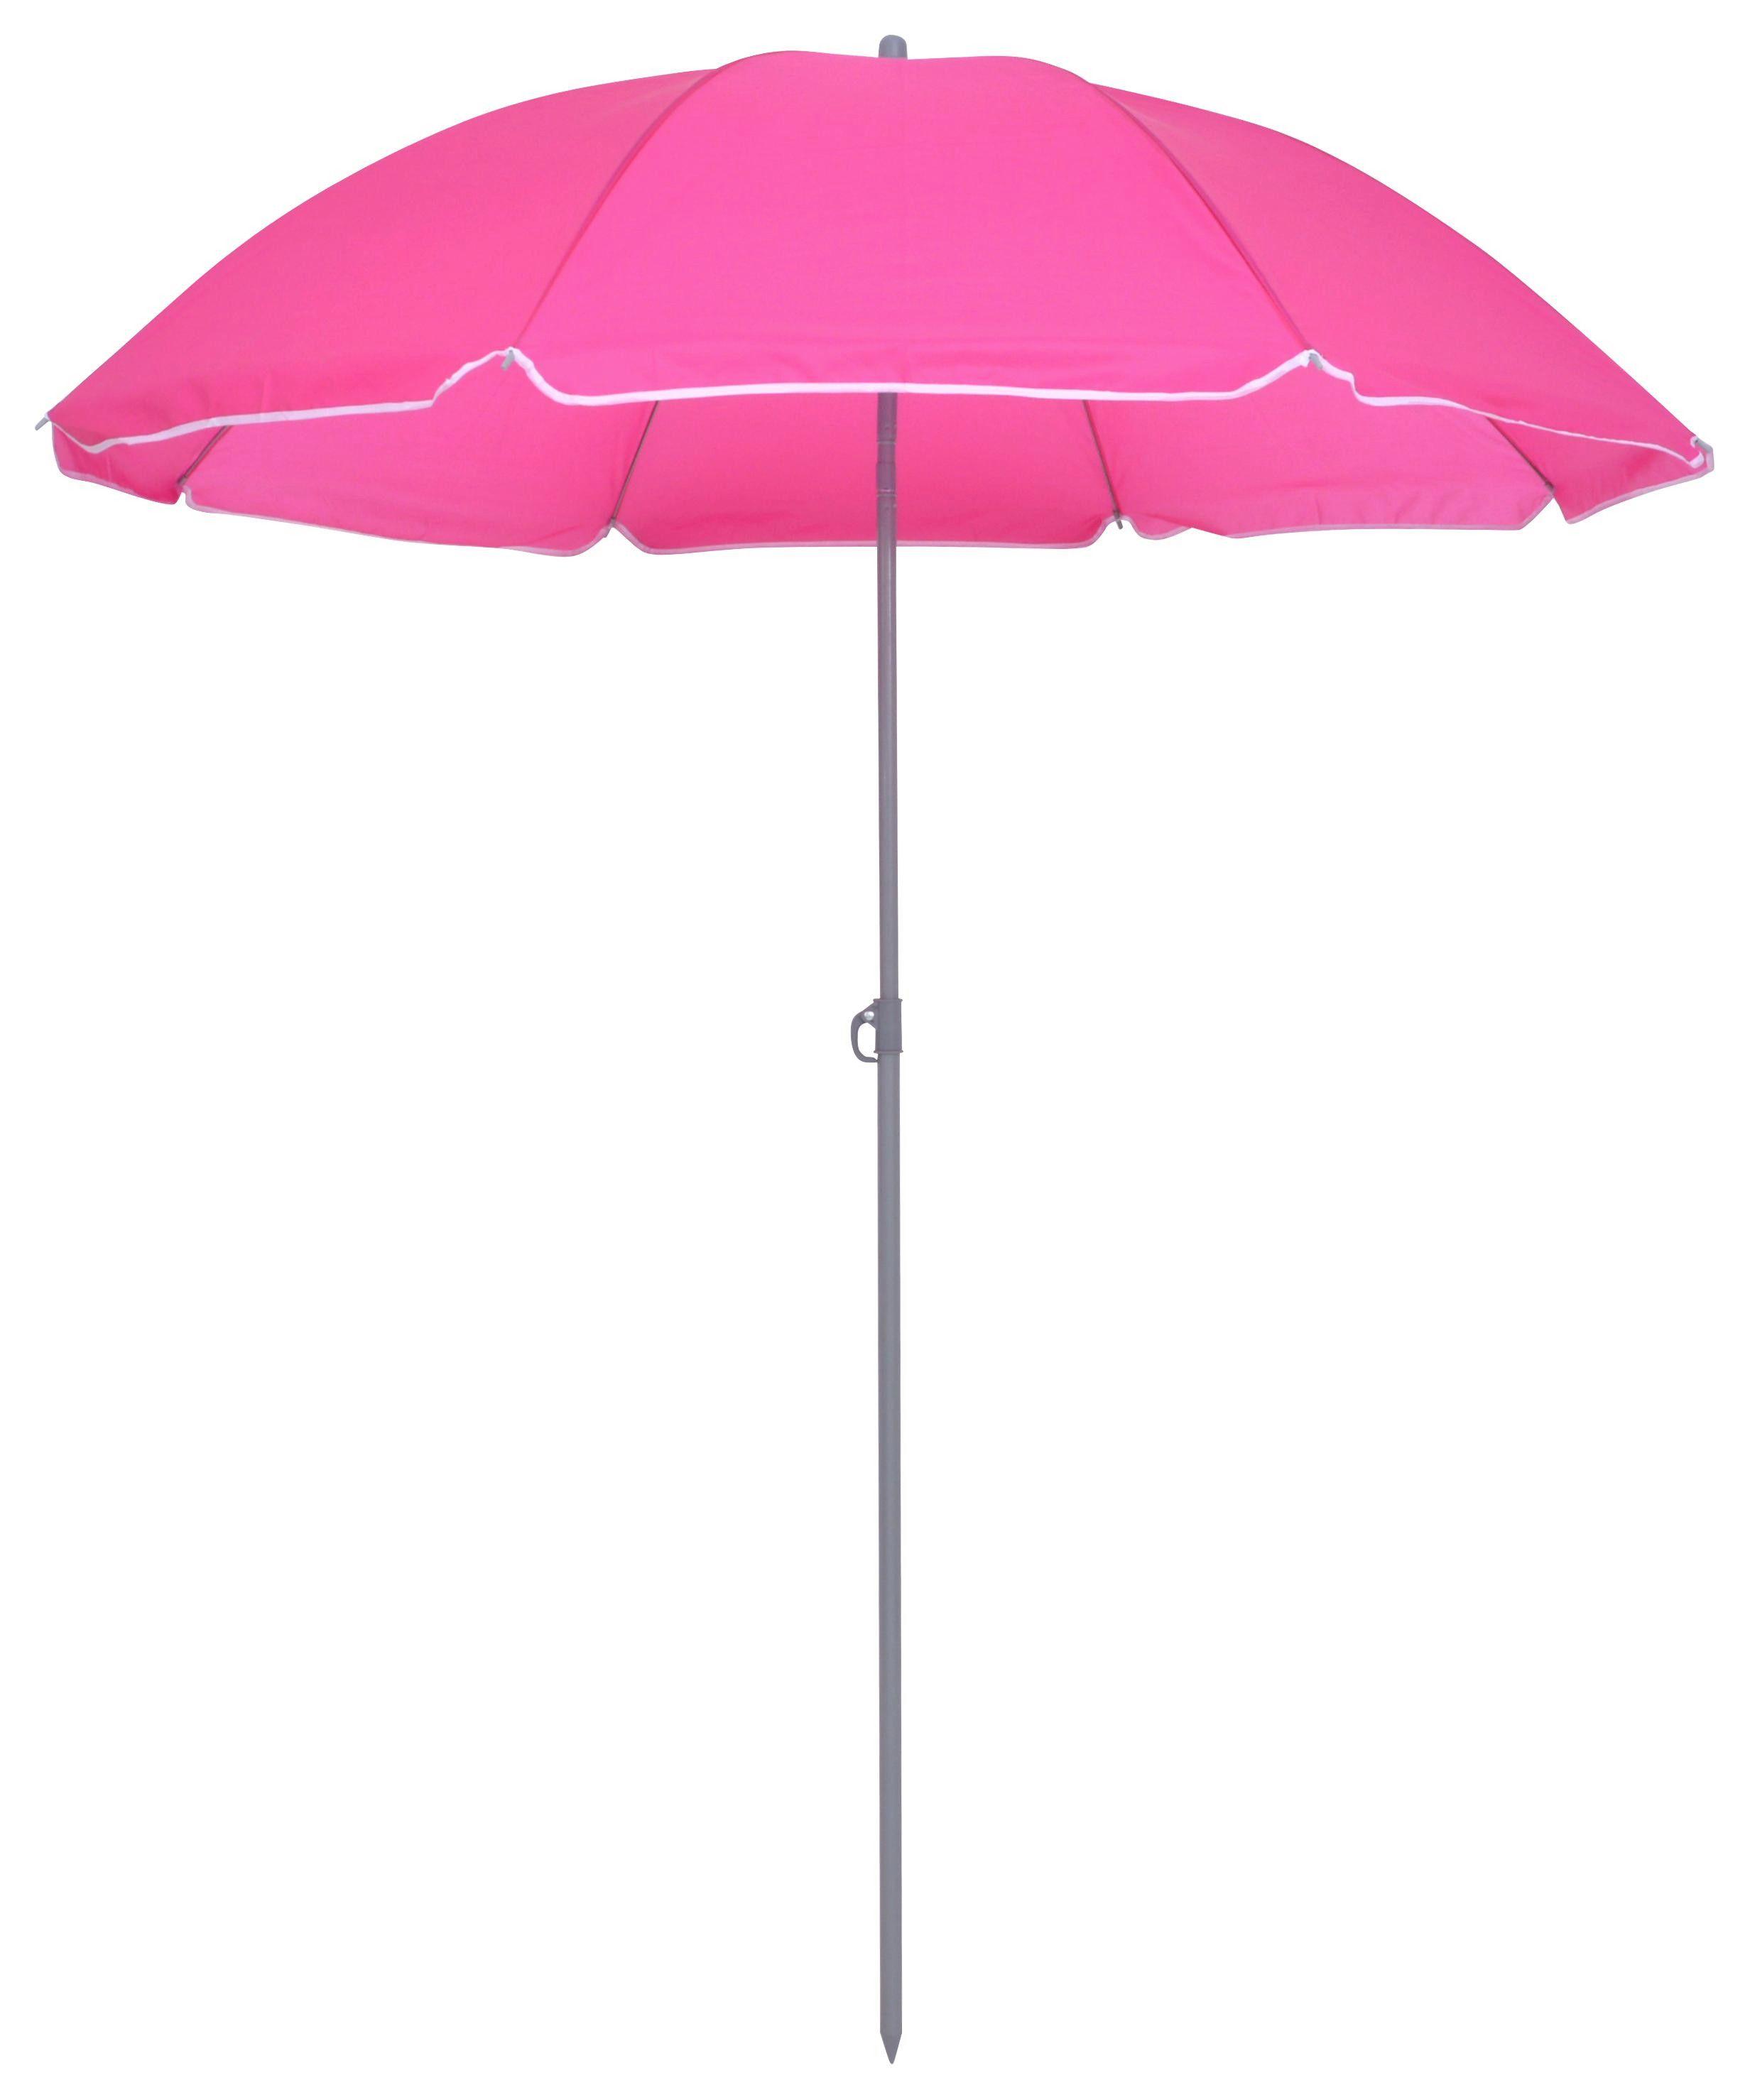 Sonnenschirm Sophie 180 - Pink/Anthrazit, KONVENTIONELL, Textil/Metall (180/190cm) - Ombra